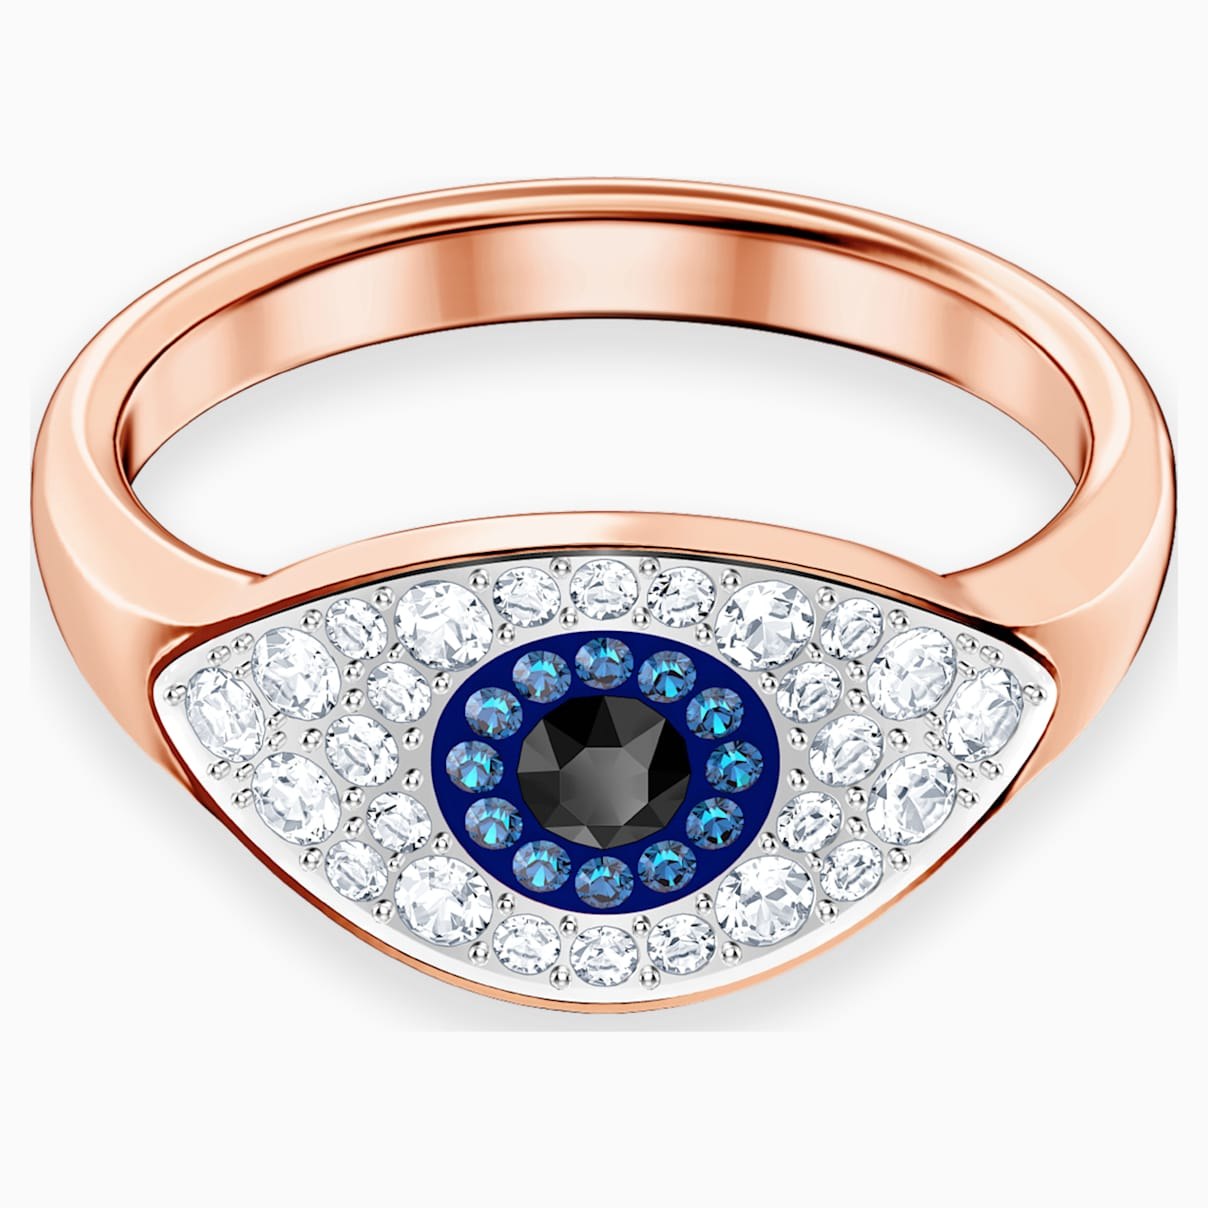 Bague swarovski symbolic evil eye multicolore métal doré rose